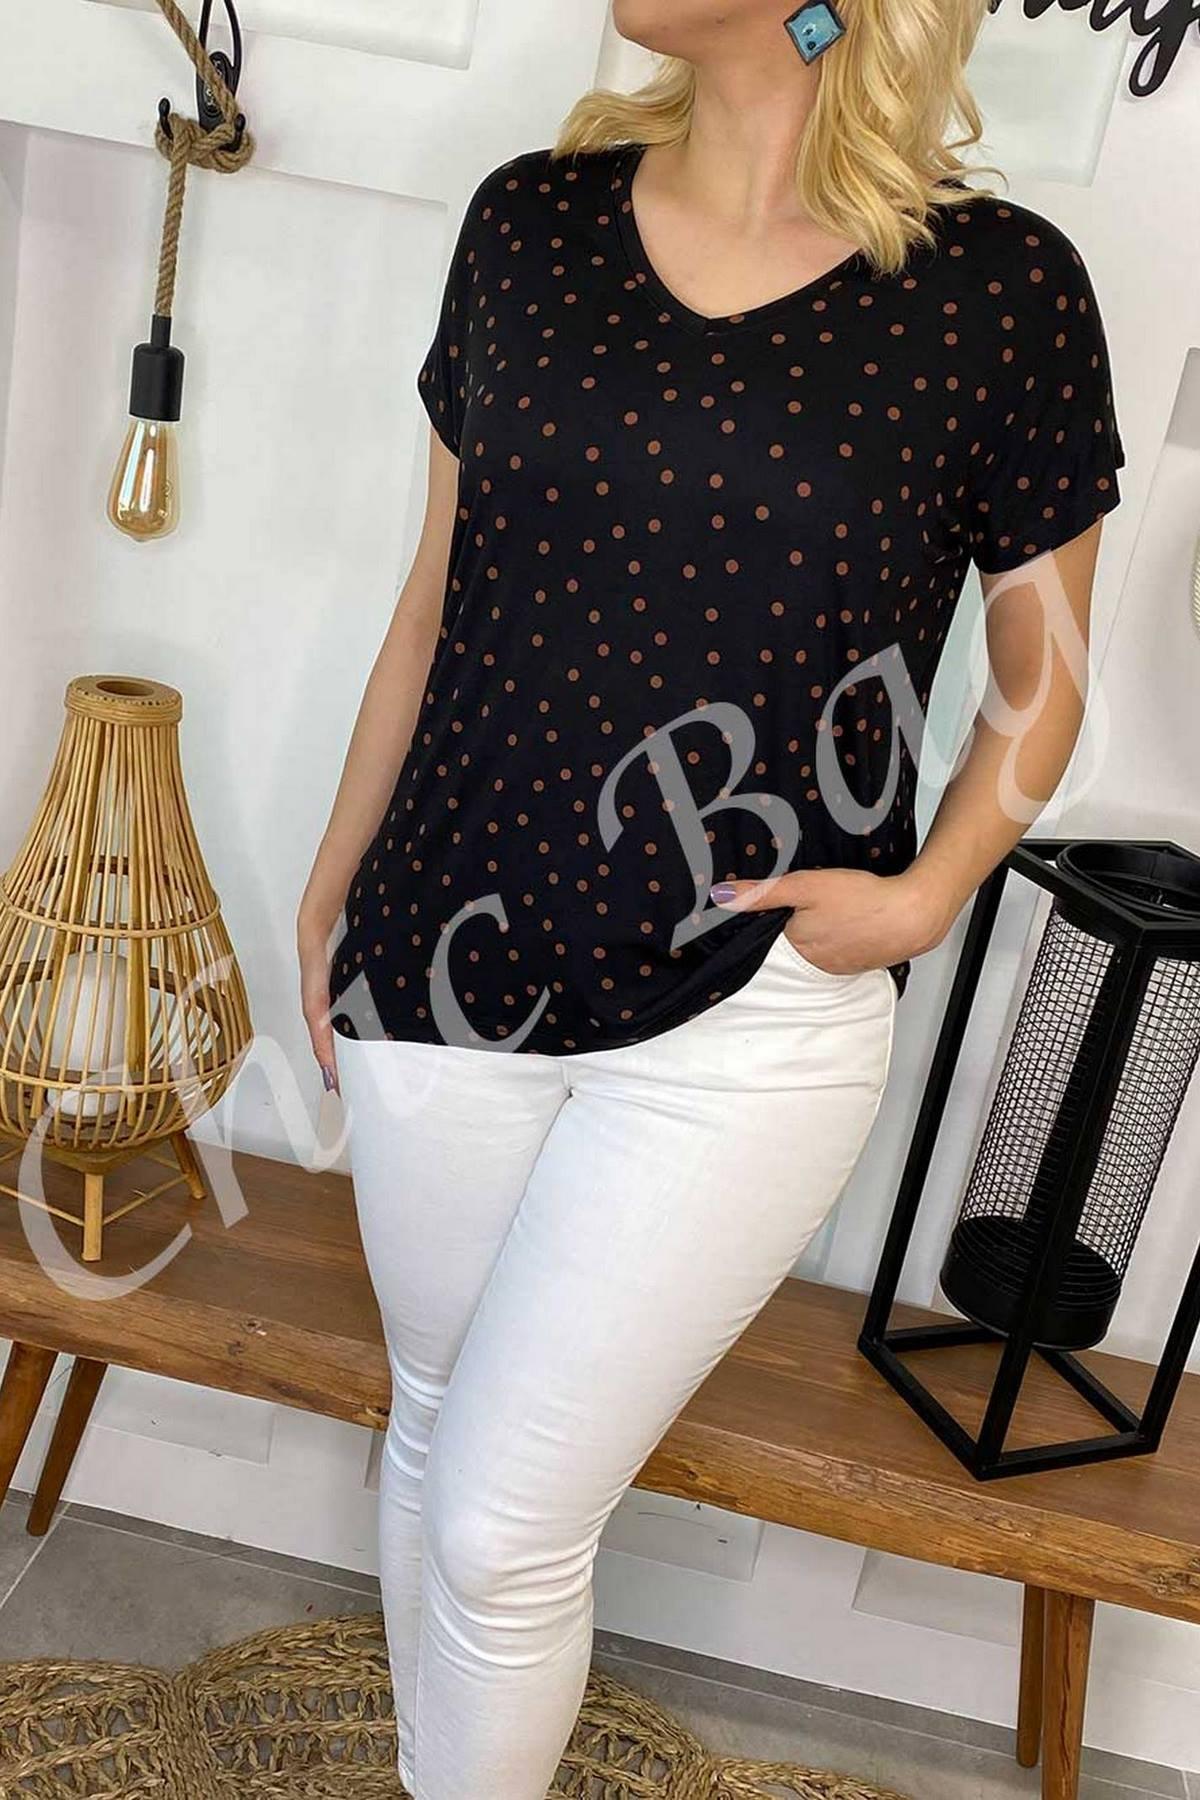 https://resim.chicbag.com.tr/p000960/shy/kucuk-puantiyeli-basic-t-shirt-01df4f8b51aa.